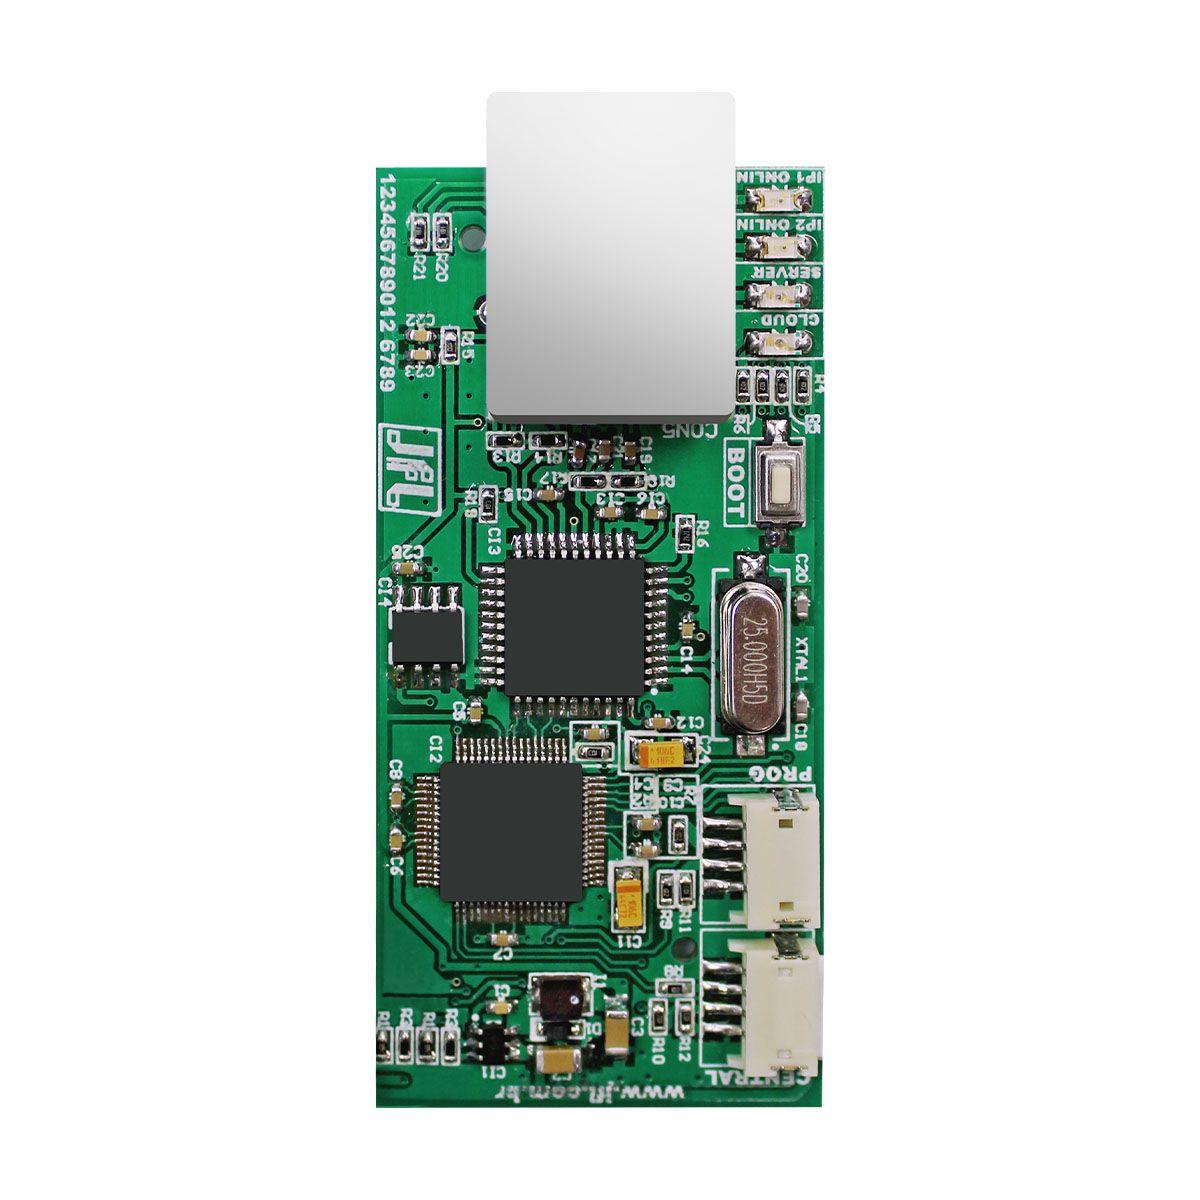 Kit Alarme Smartcloud 18 Jfl Discadora Gsm e Sensores Idx 1001 e Ird 640